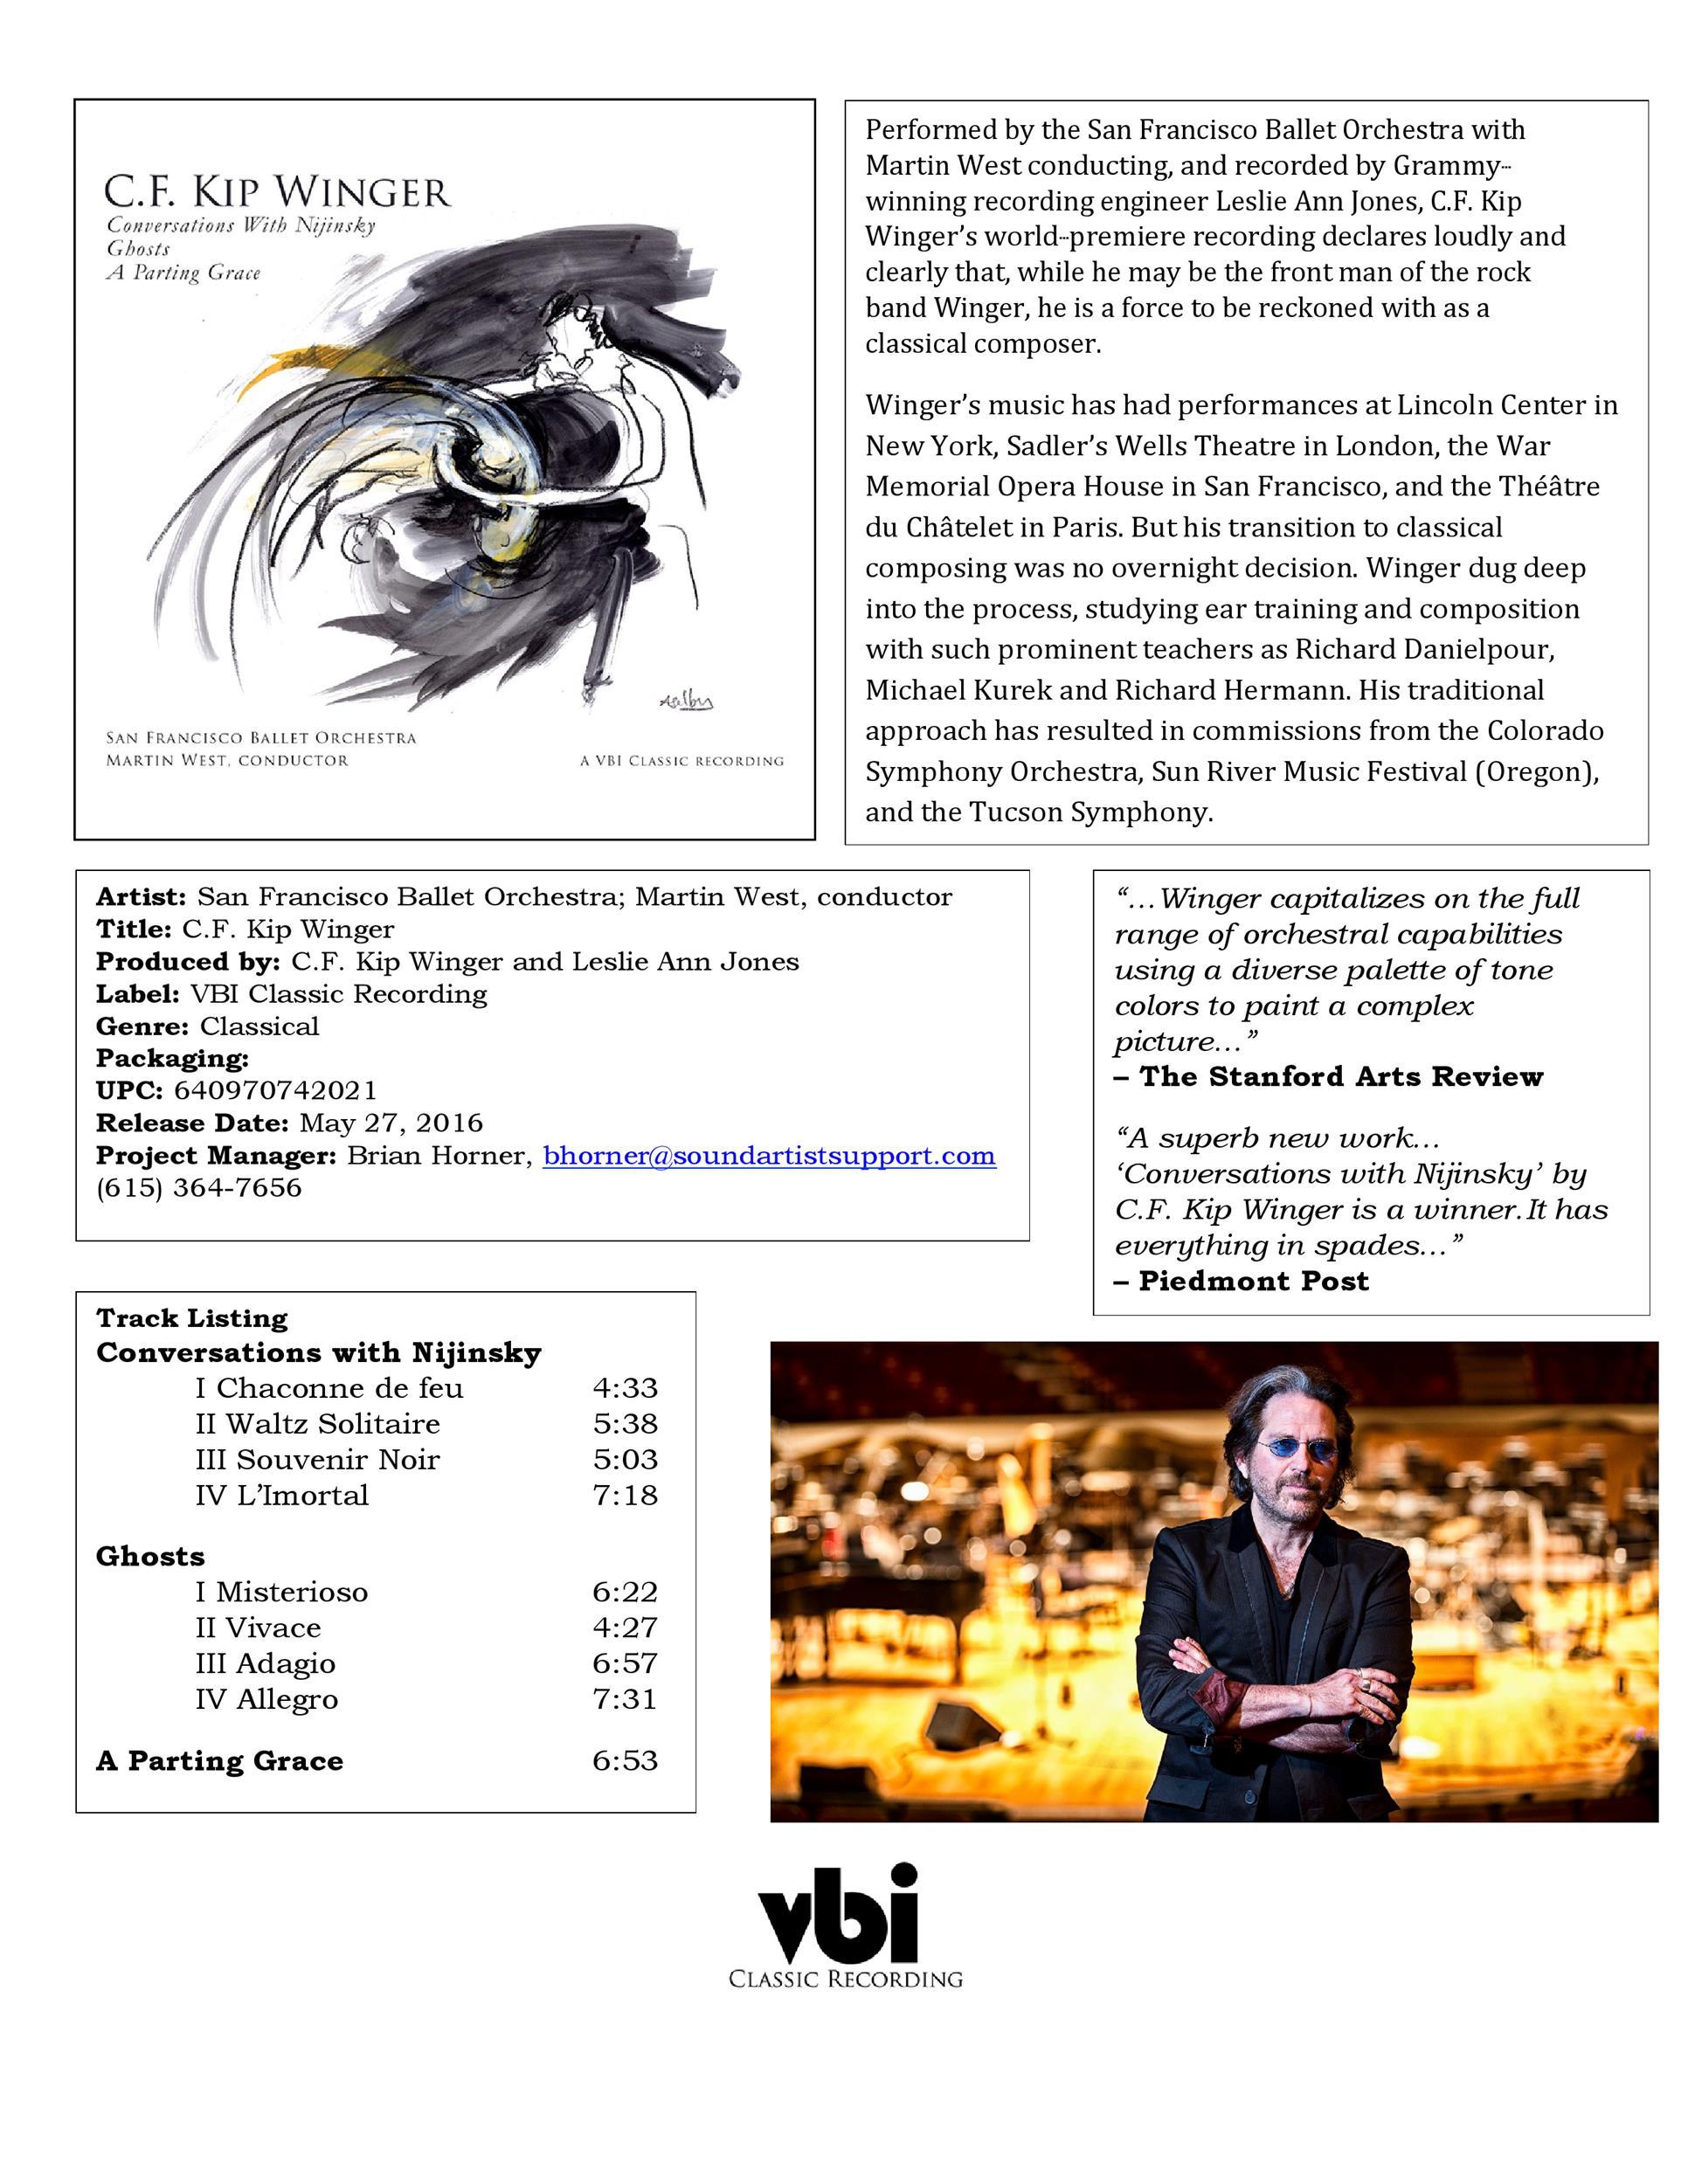 Free press kit template 05